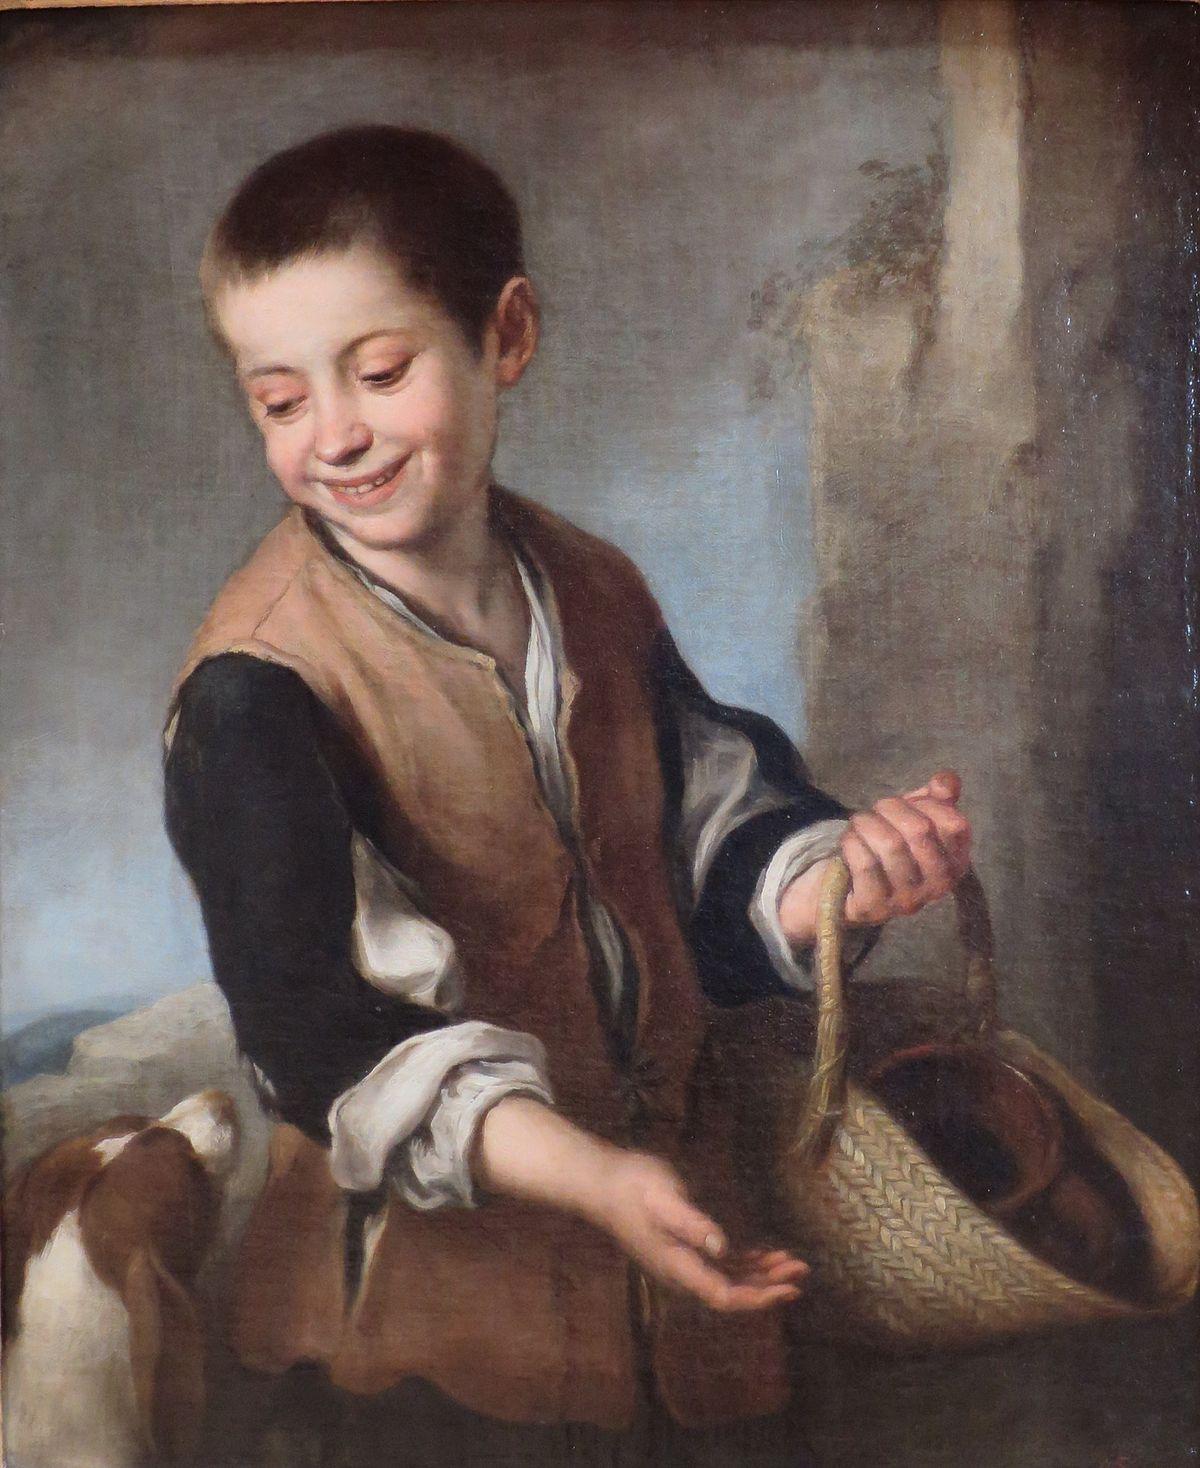 Muchacho con un perro - Wikipedia, la enciclopedia libre